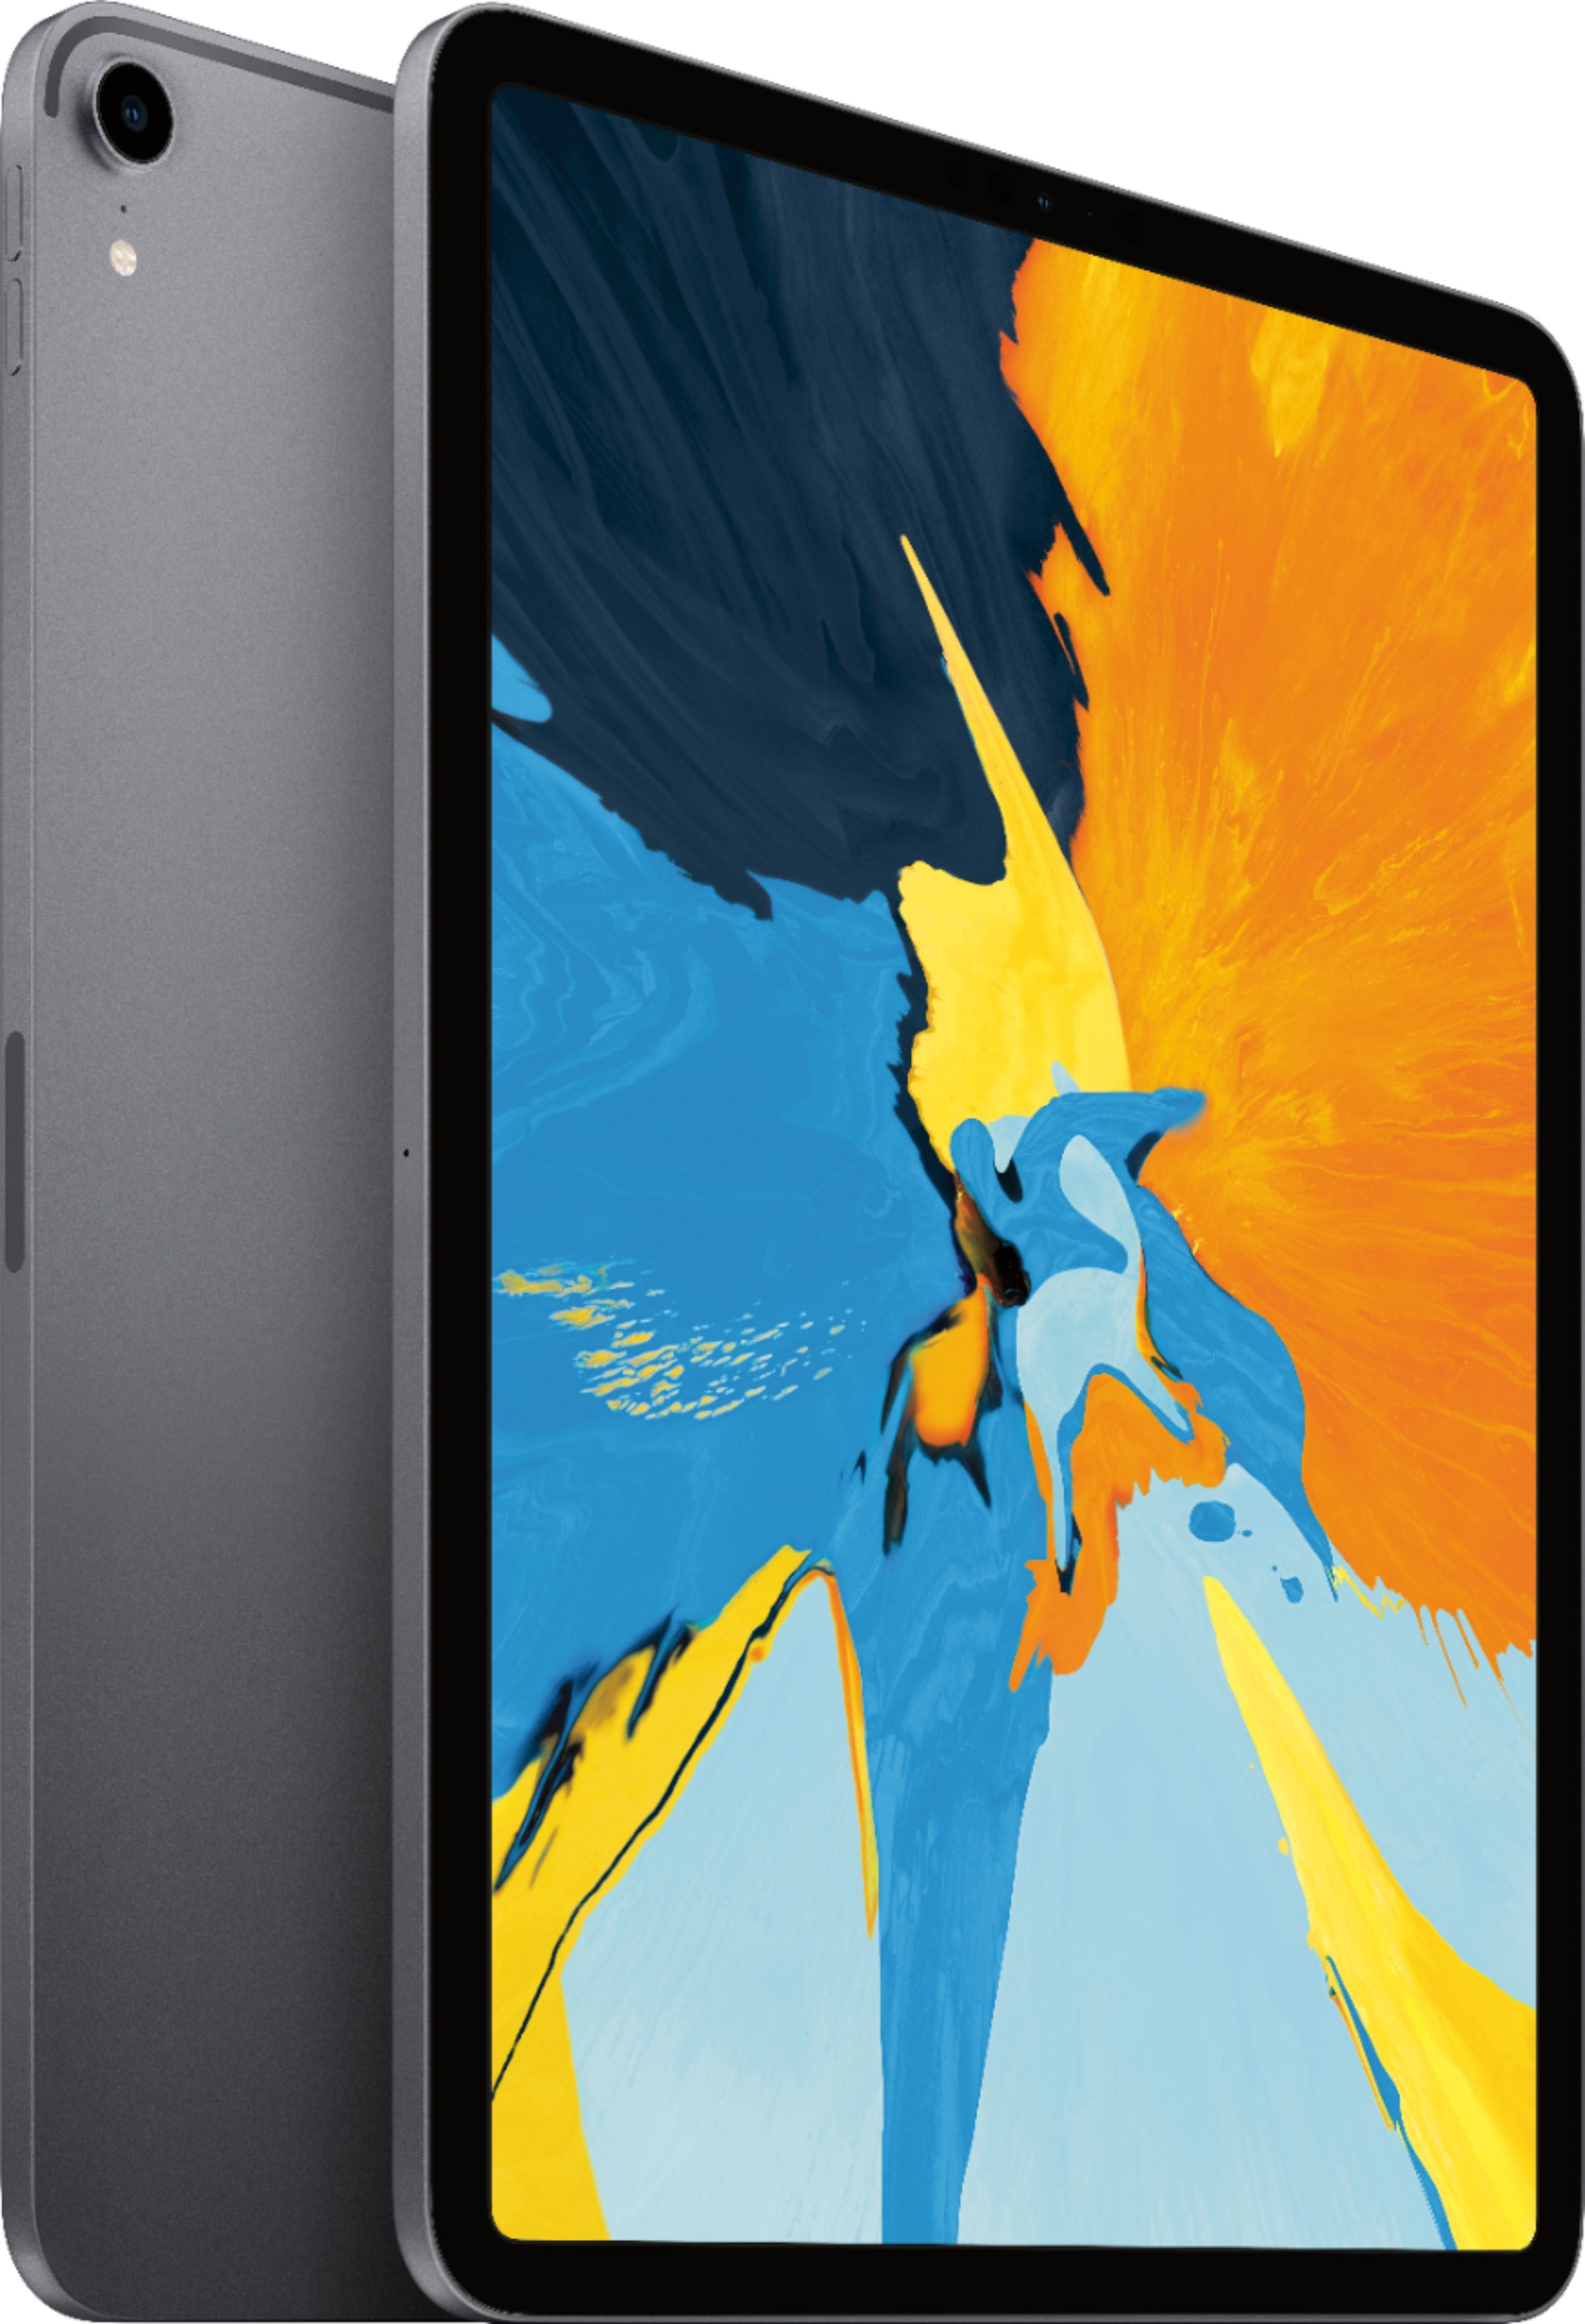 Apple - 11-Inch iPad Pro (Latest Model) with Wi-Fi - 64GB - Space Gray (& 12.9-Inch iPad Pro) $674.99